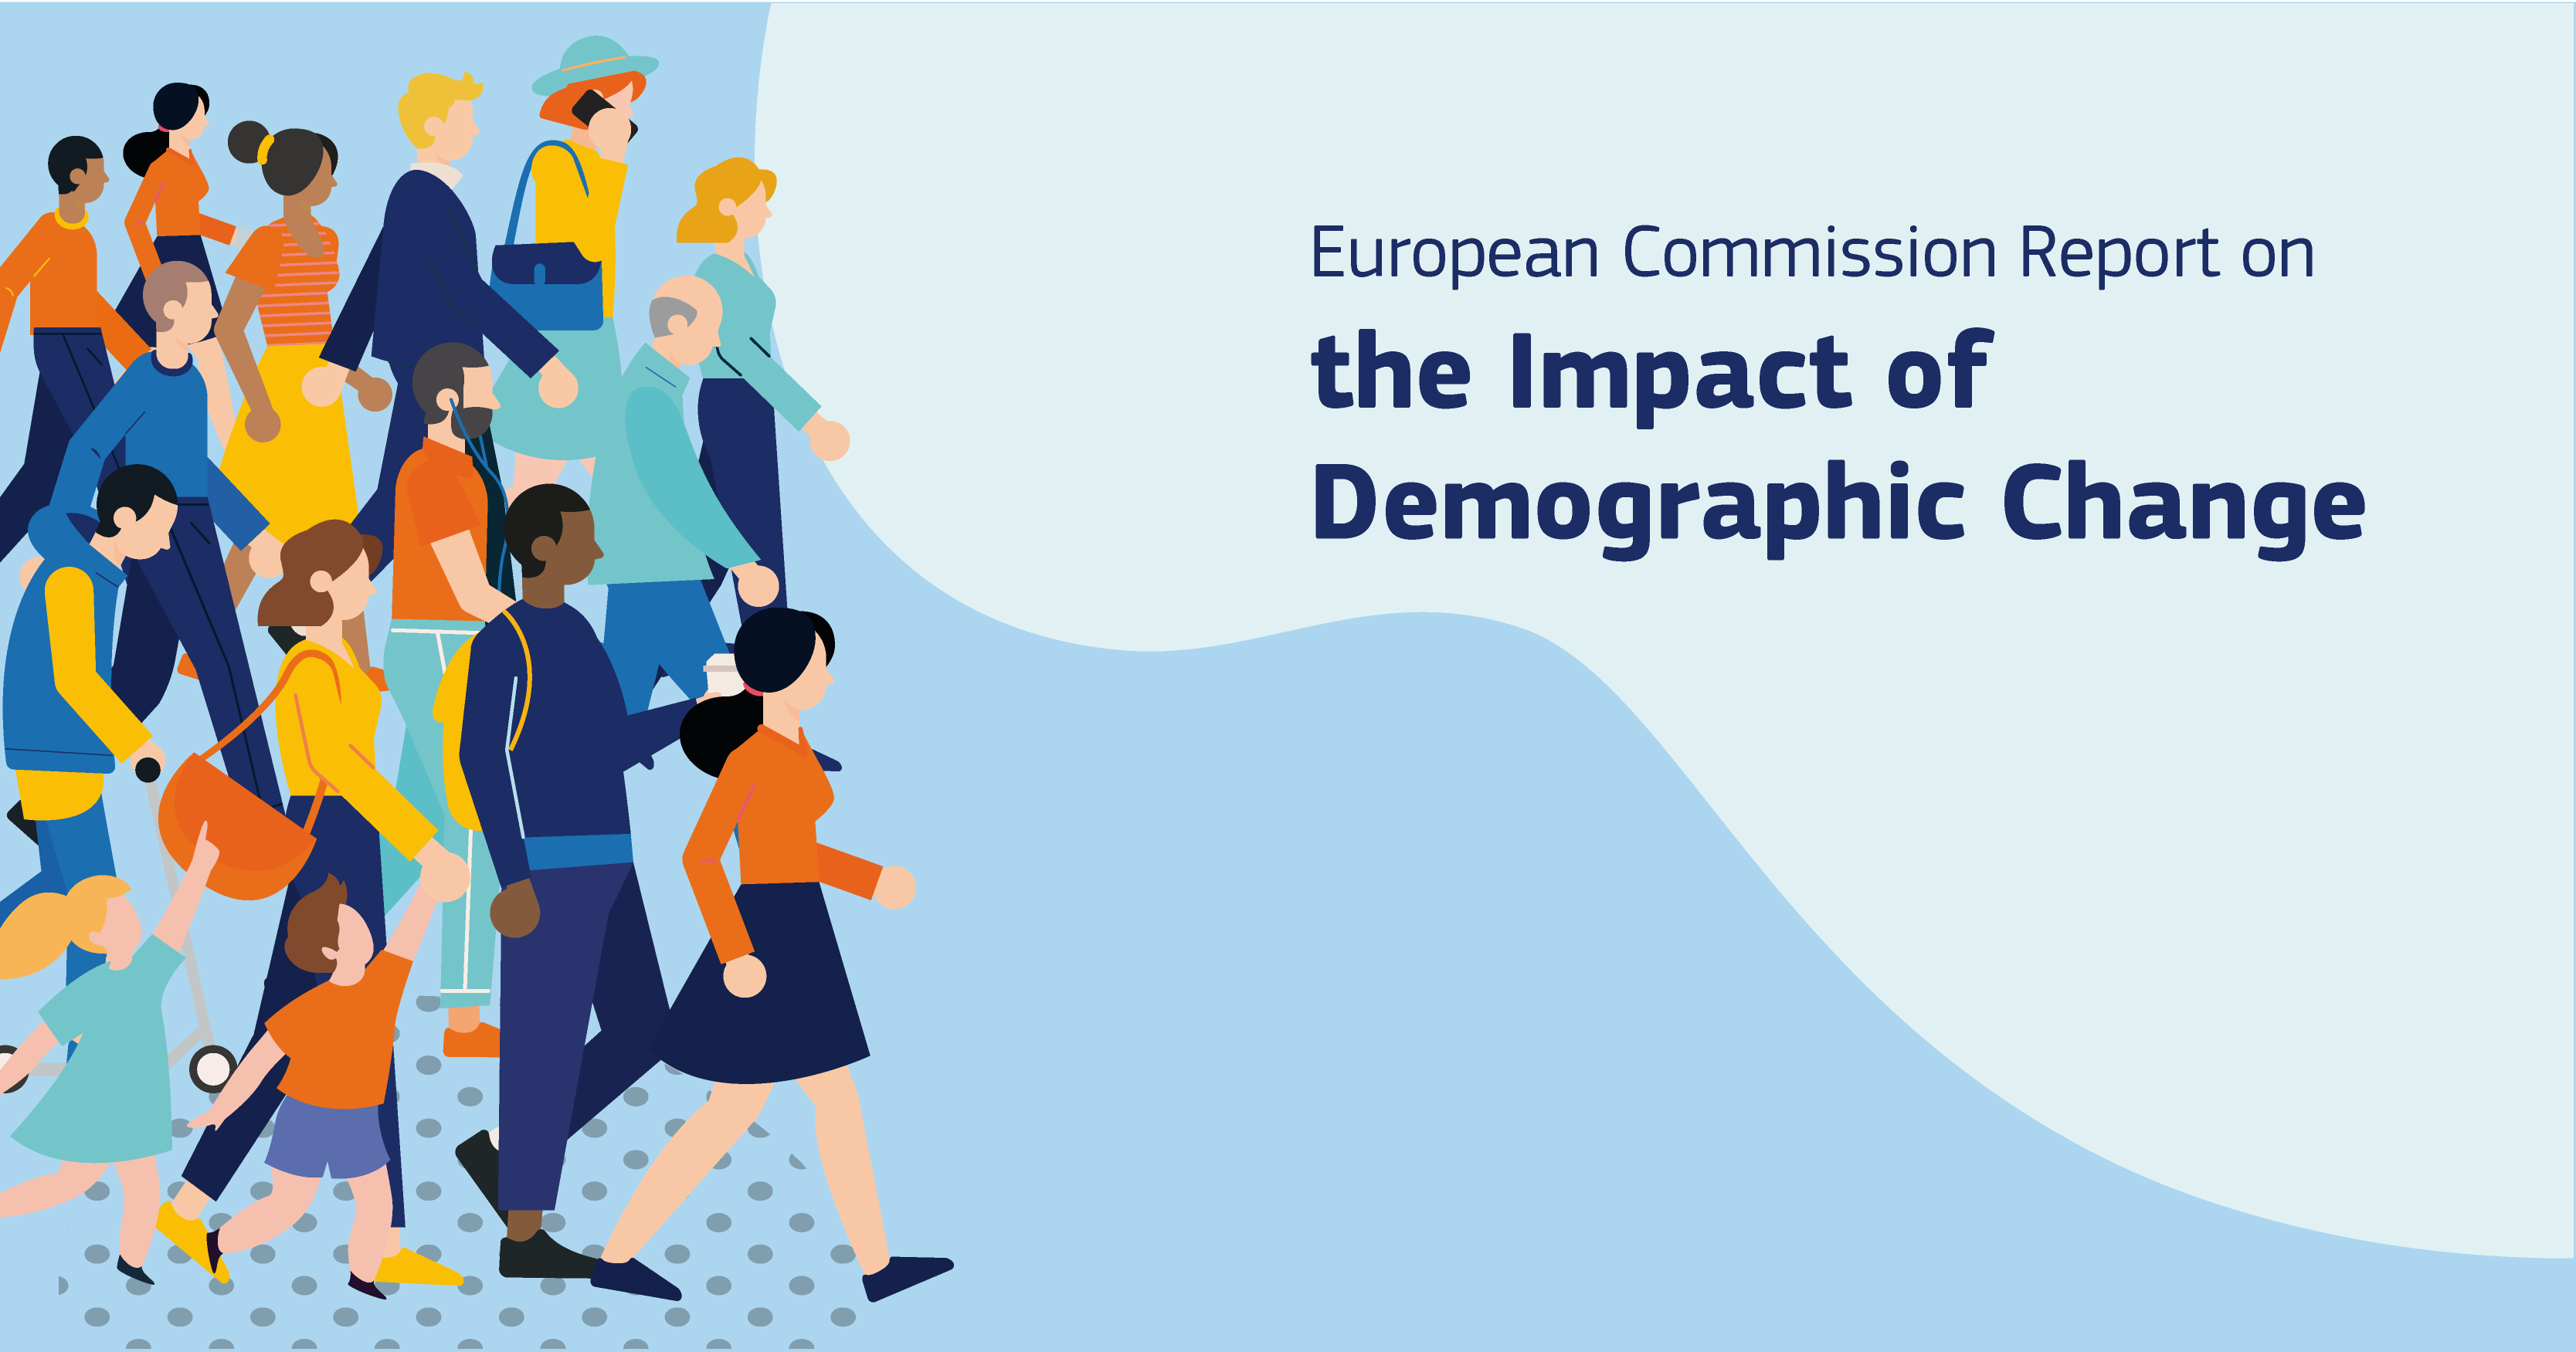 Impact of Demographic Change